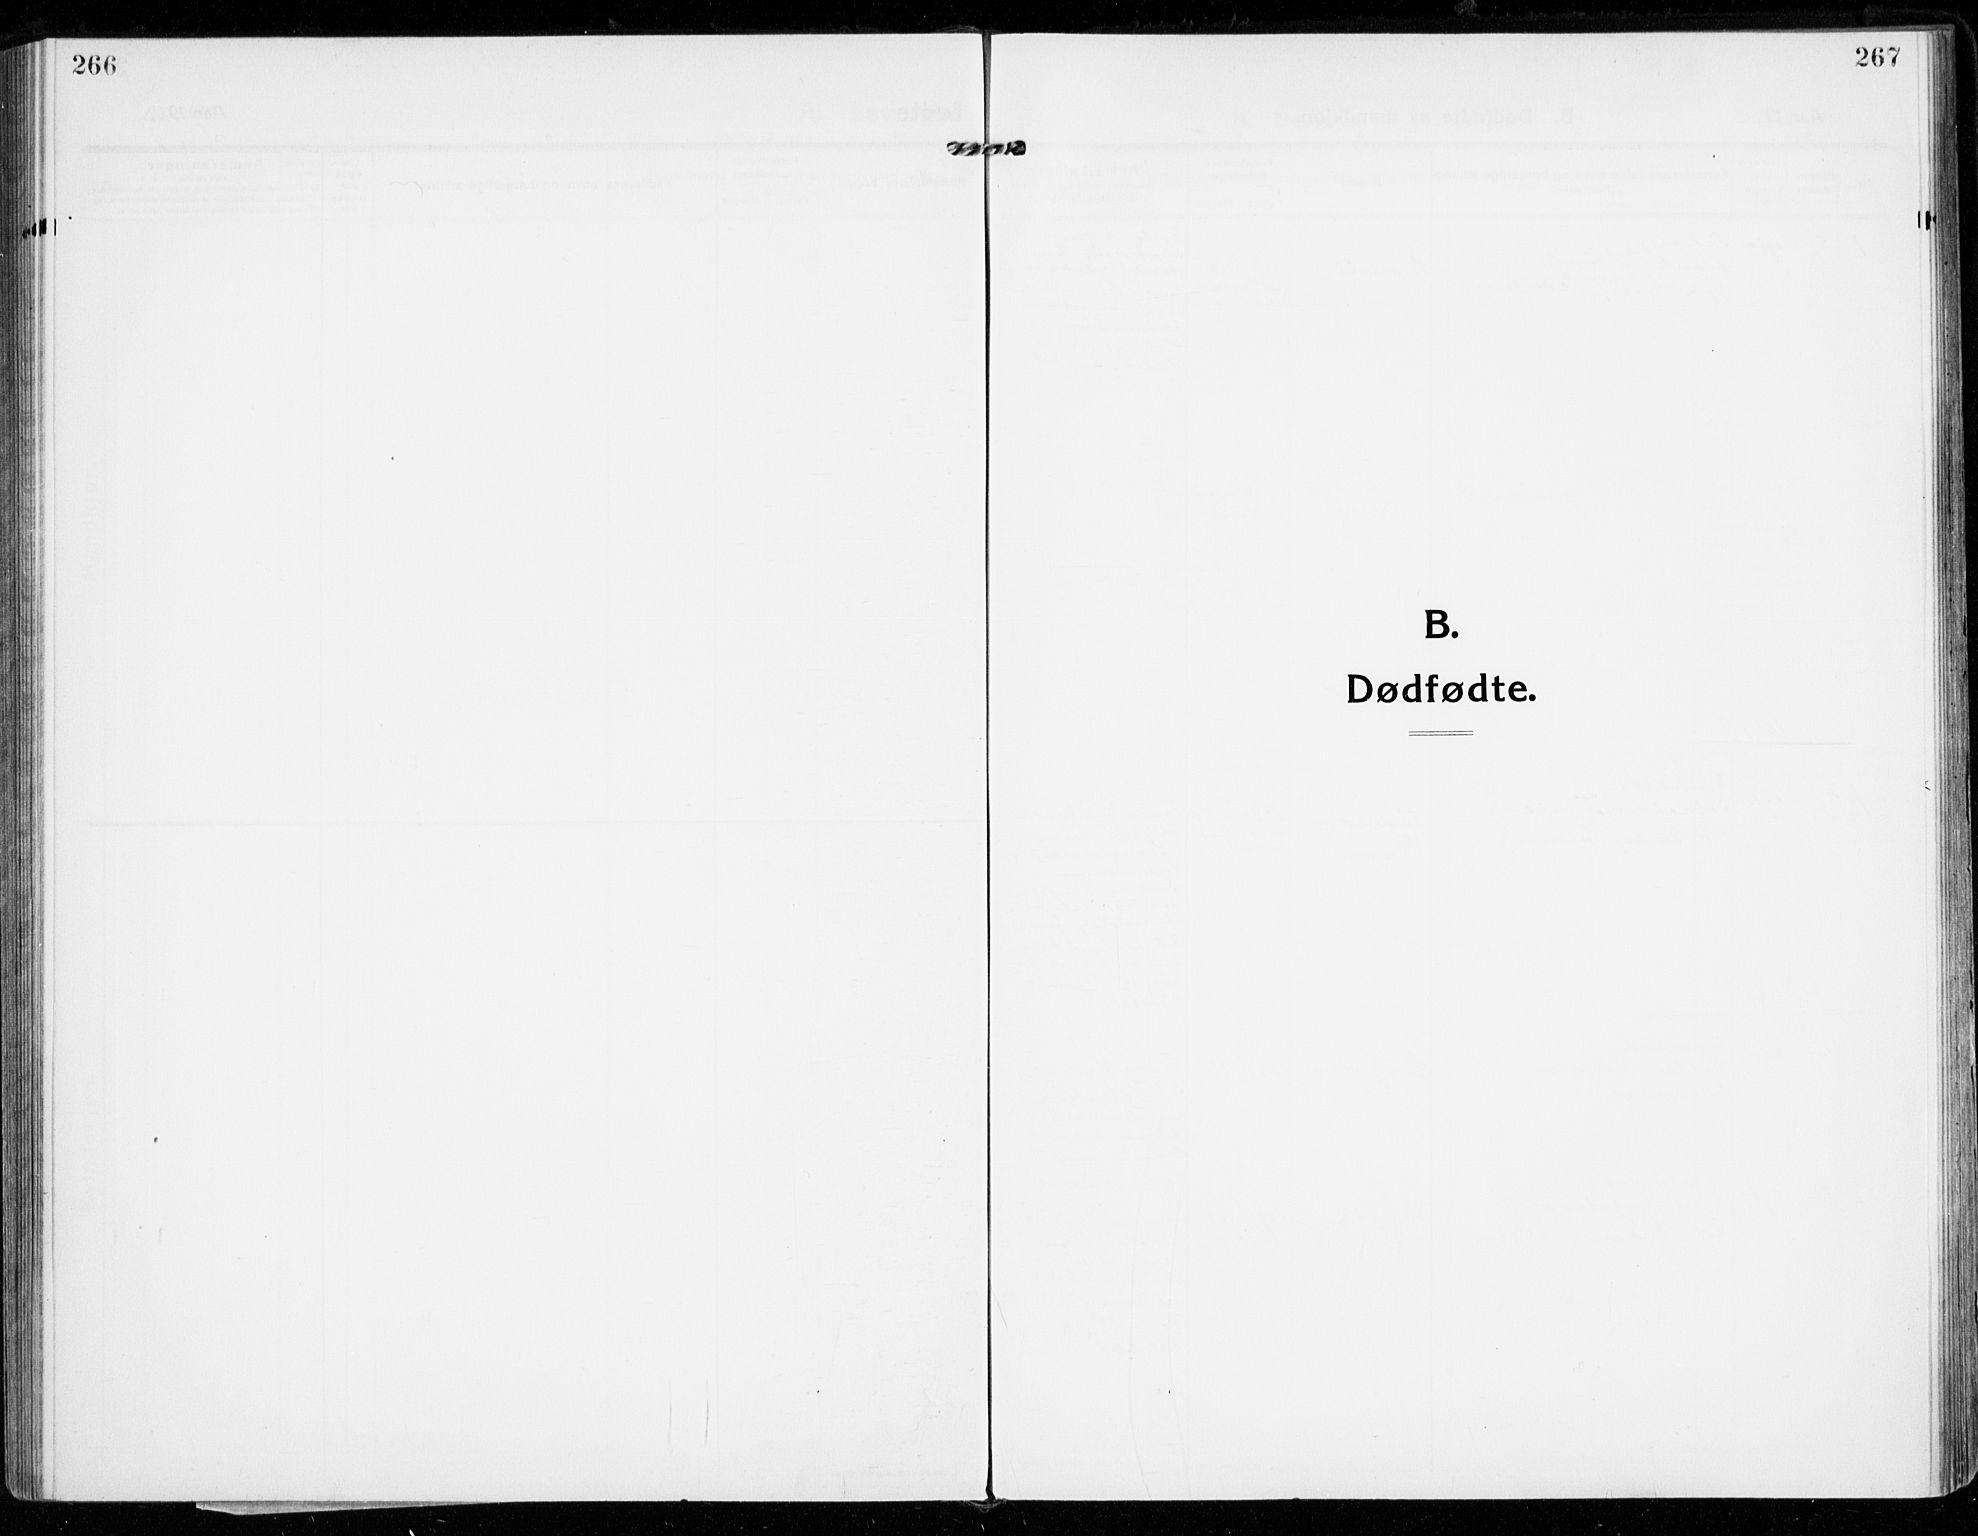 SAKO, Strømsgodset kirkebøker, F/Fa/L0002: Parish register (official) no. 2, 1910-1920, p. 266-267